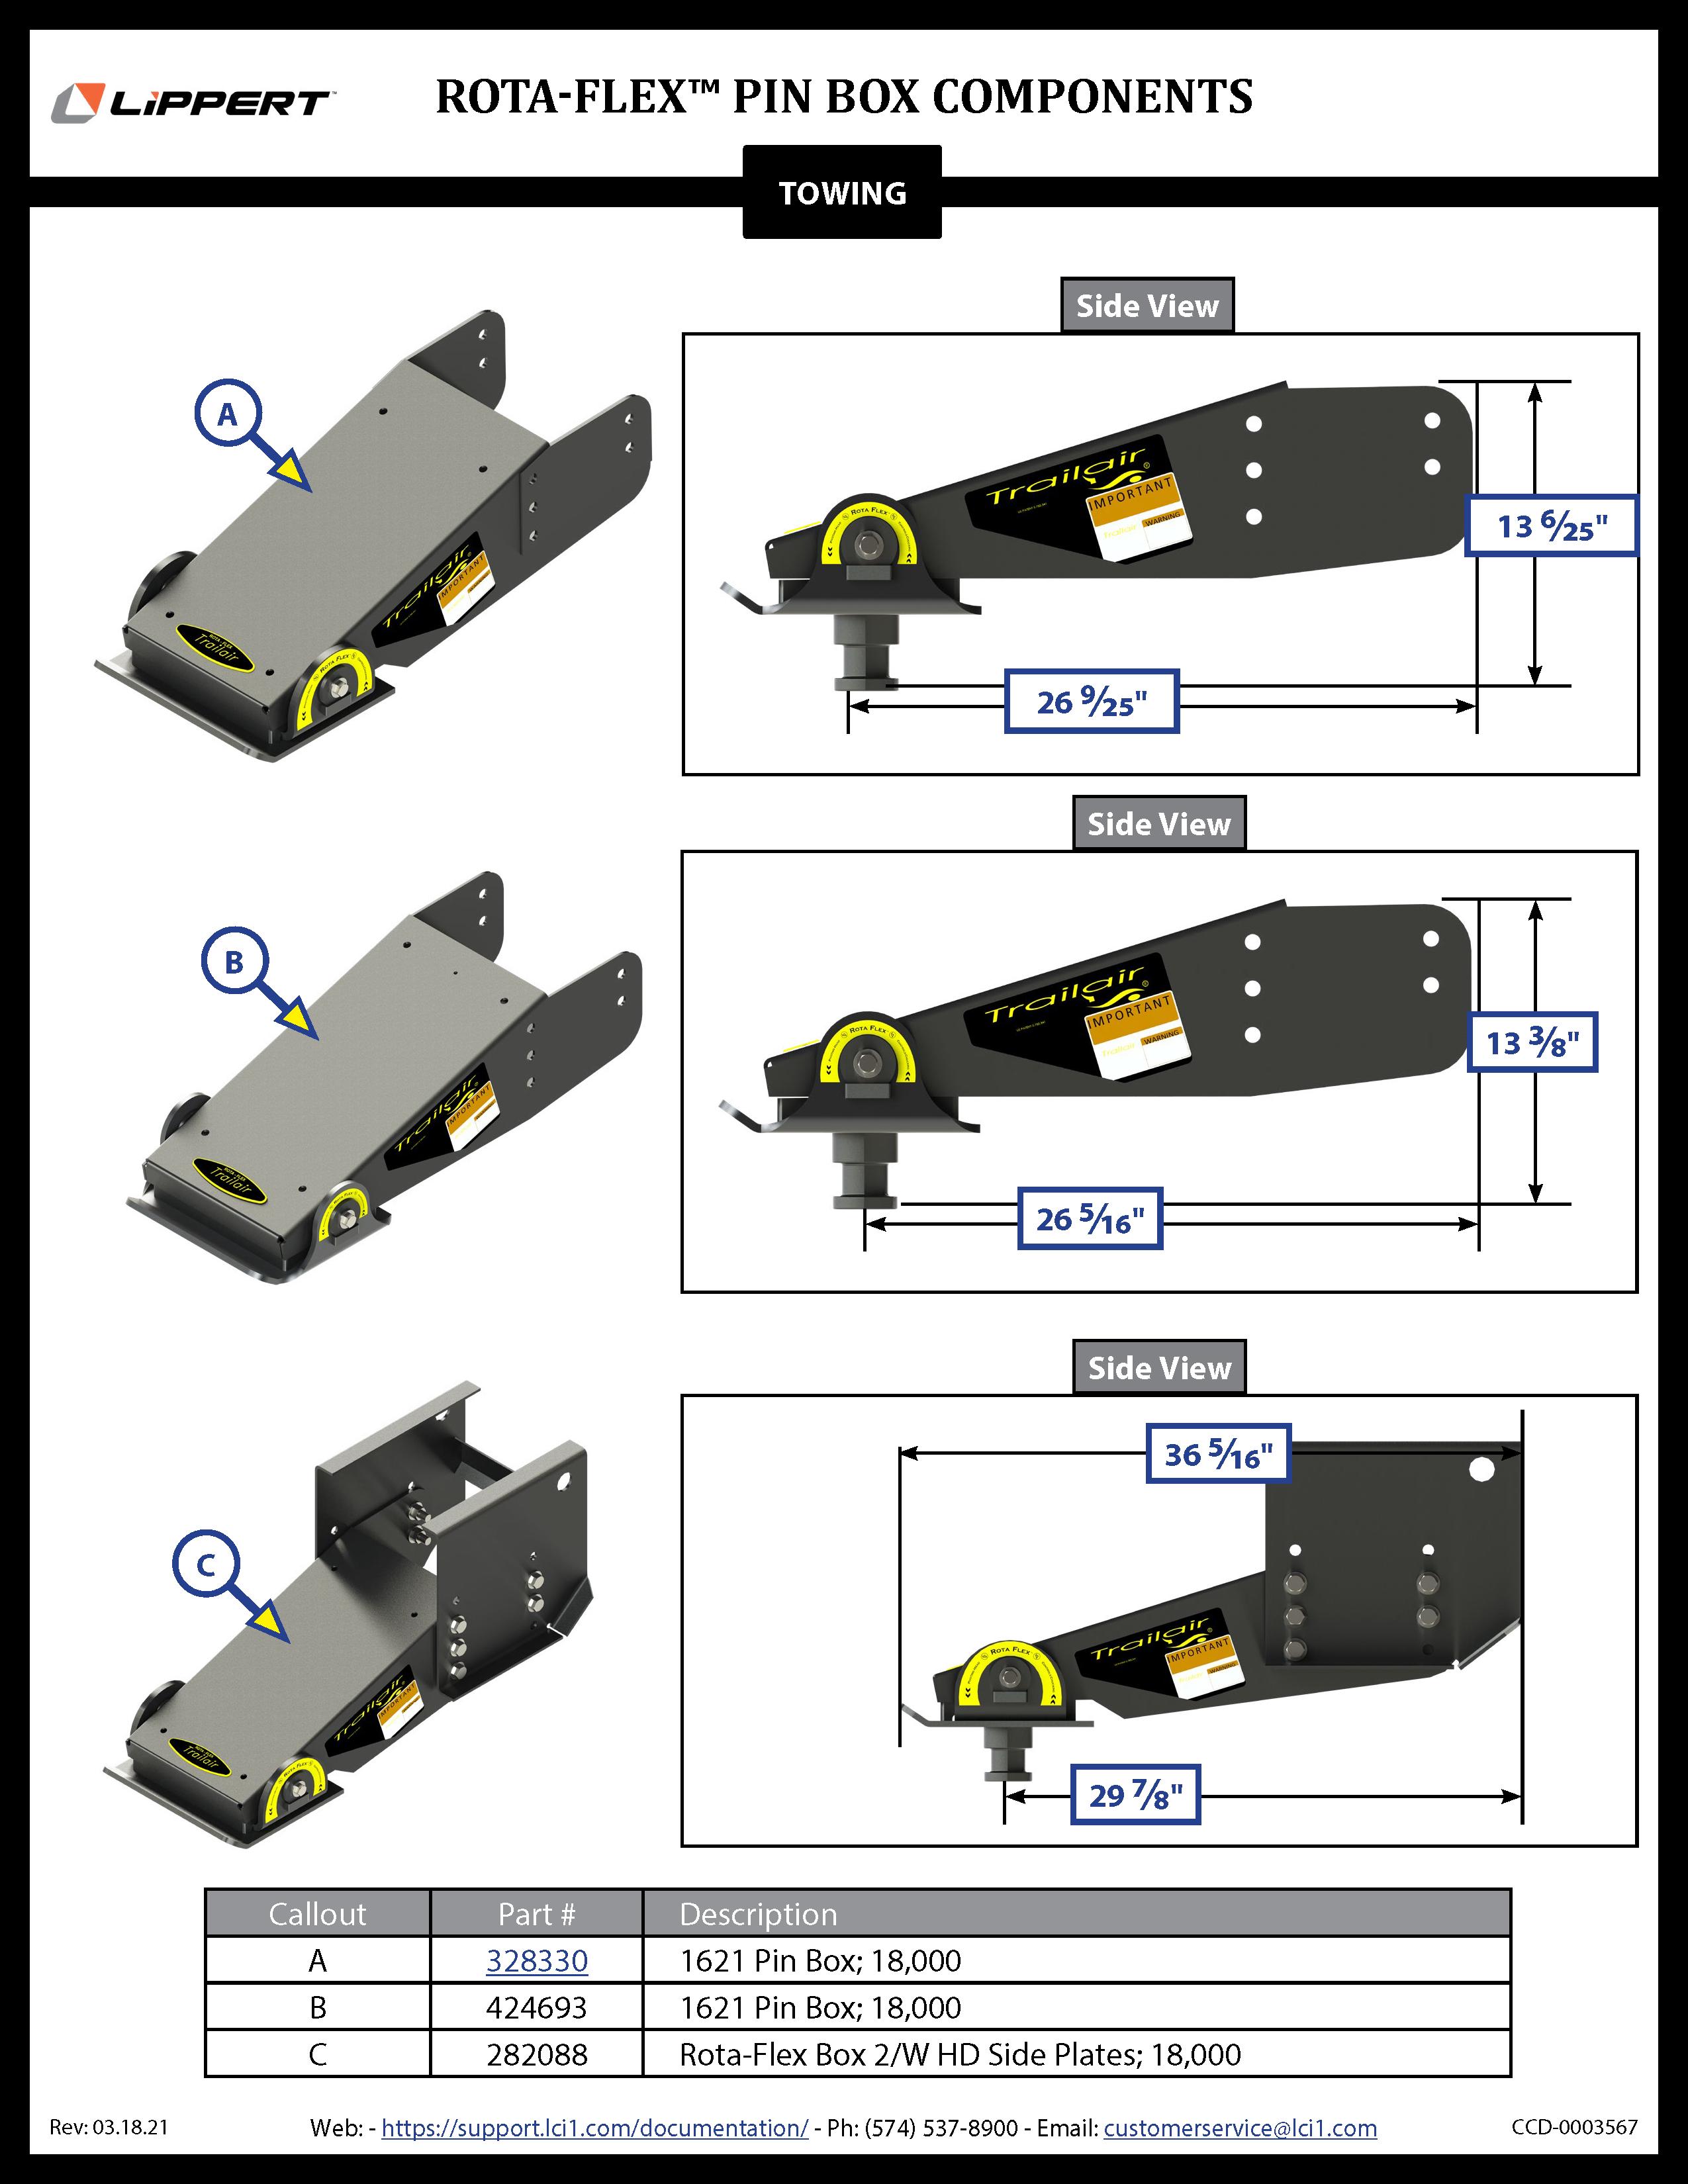 Rota-Flex™ Pin Box Components